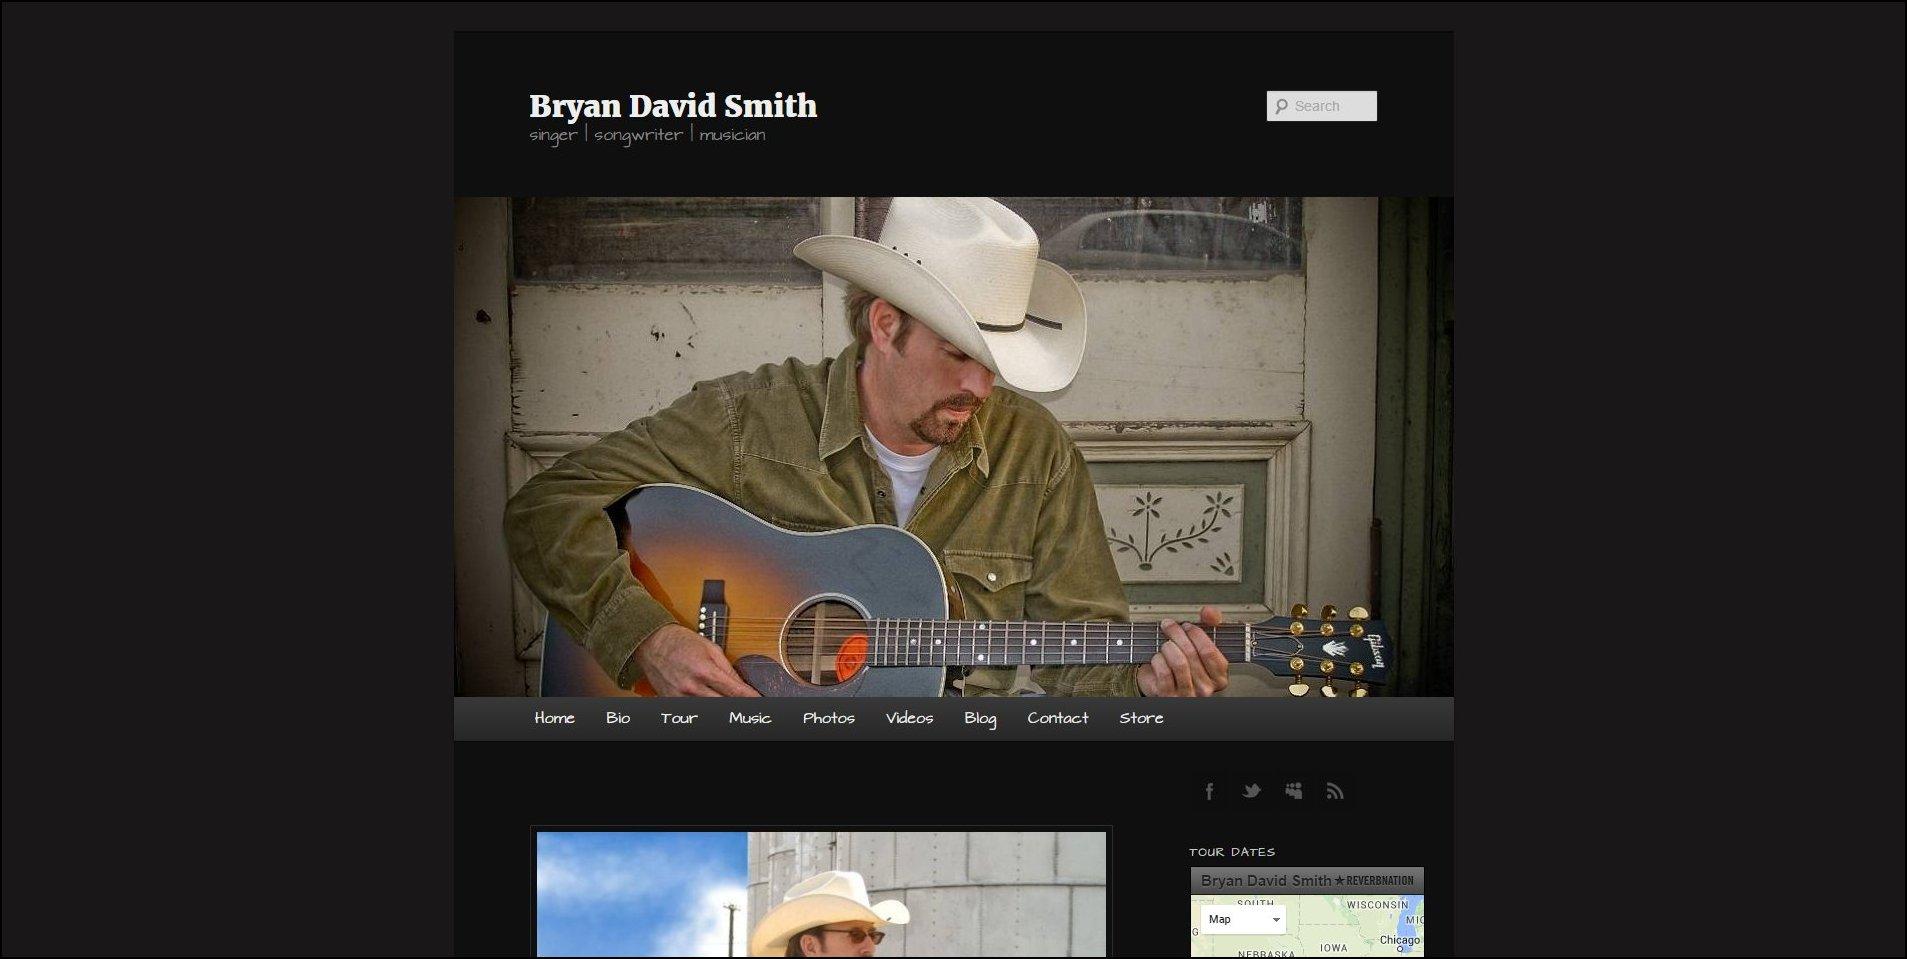 Bryan David Smith